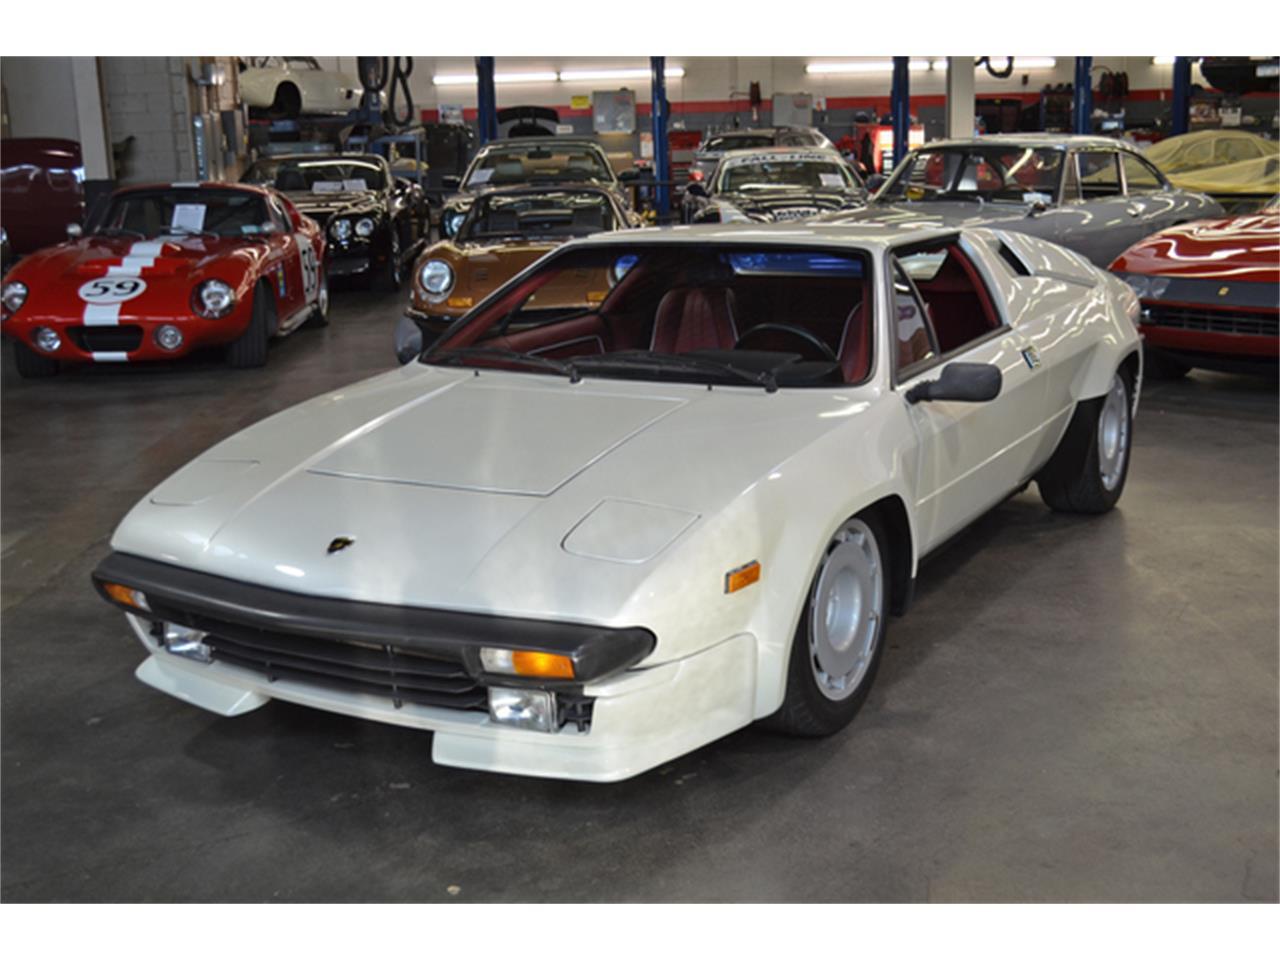 Large Picture of '87 Lamborghini Jalpa Auction Vehicle Offered by Autosport Designs Inc - M6IZ